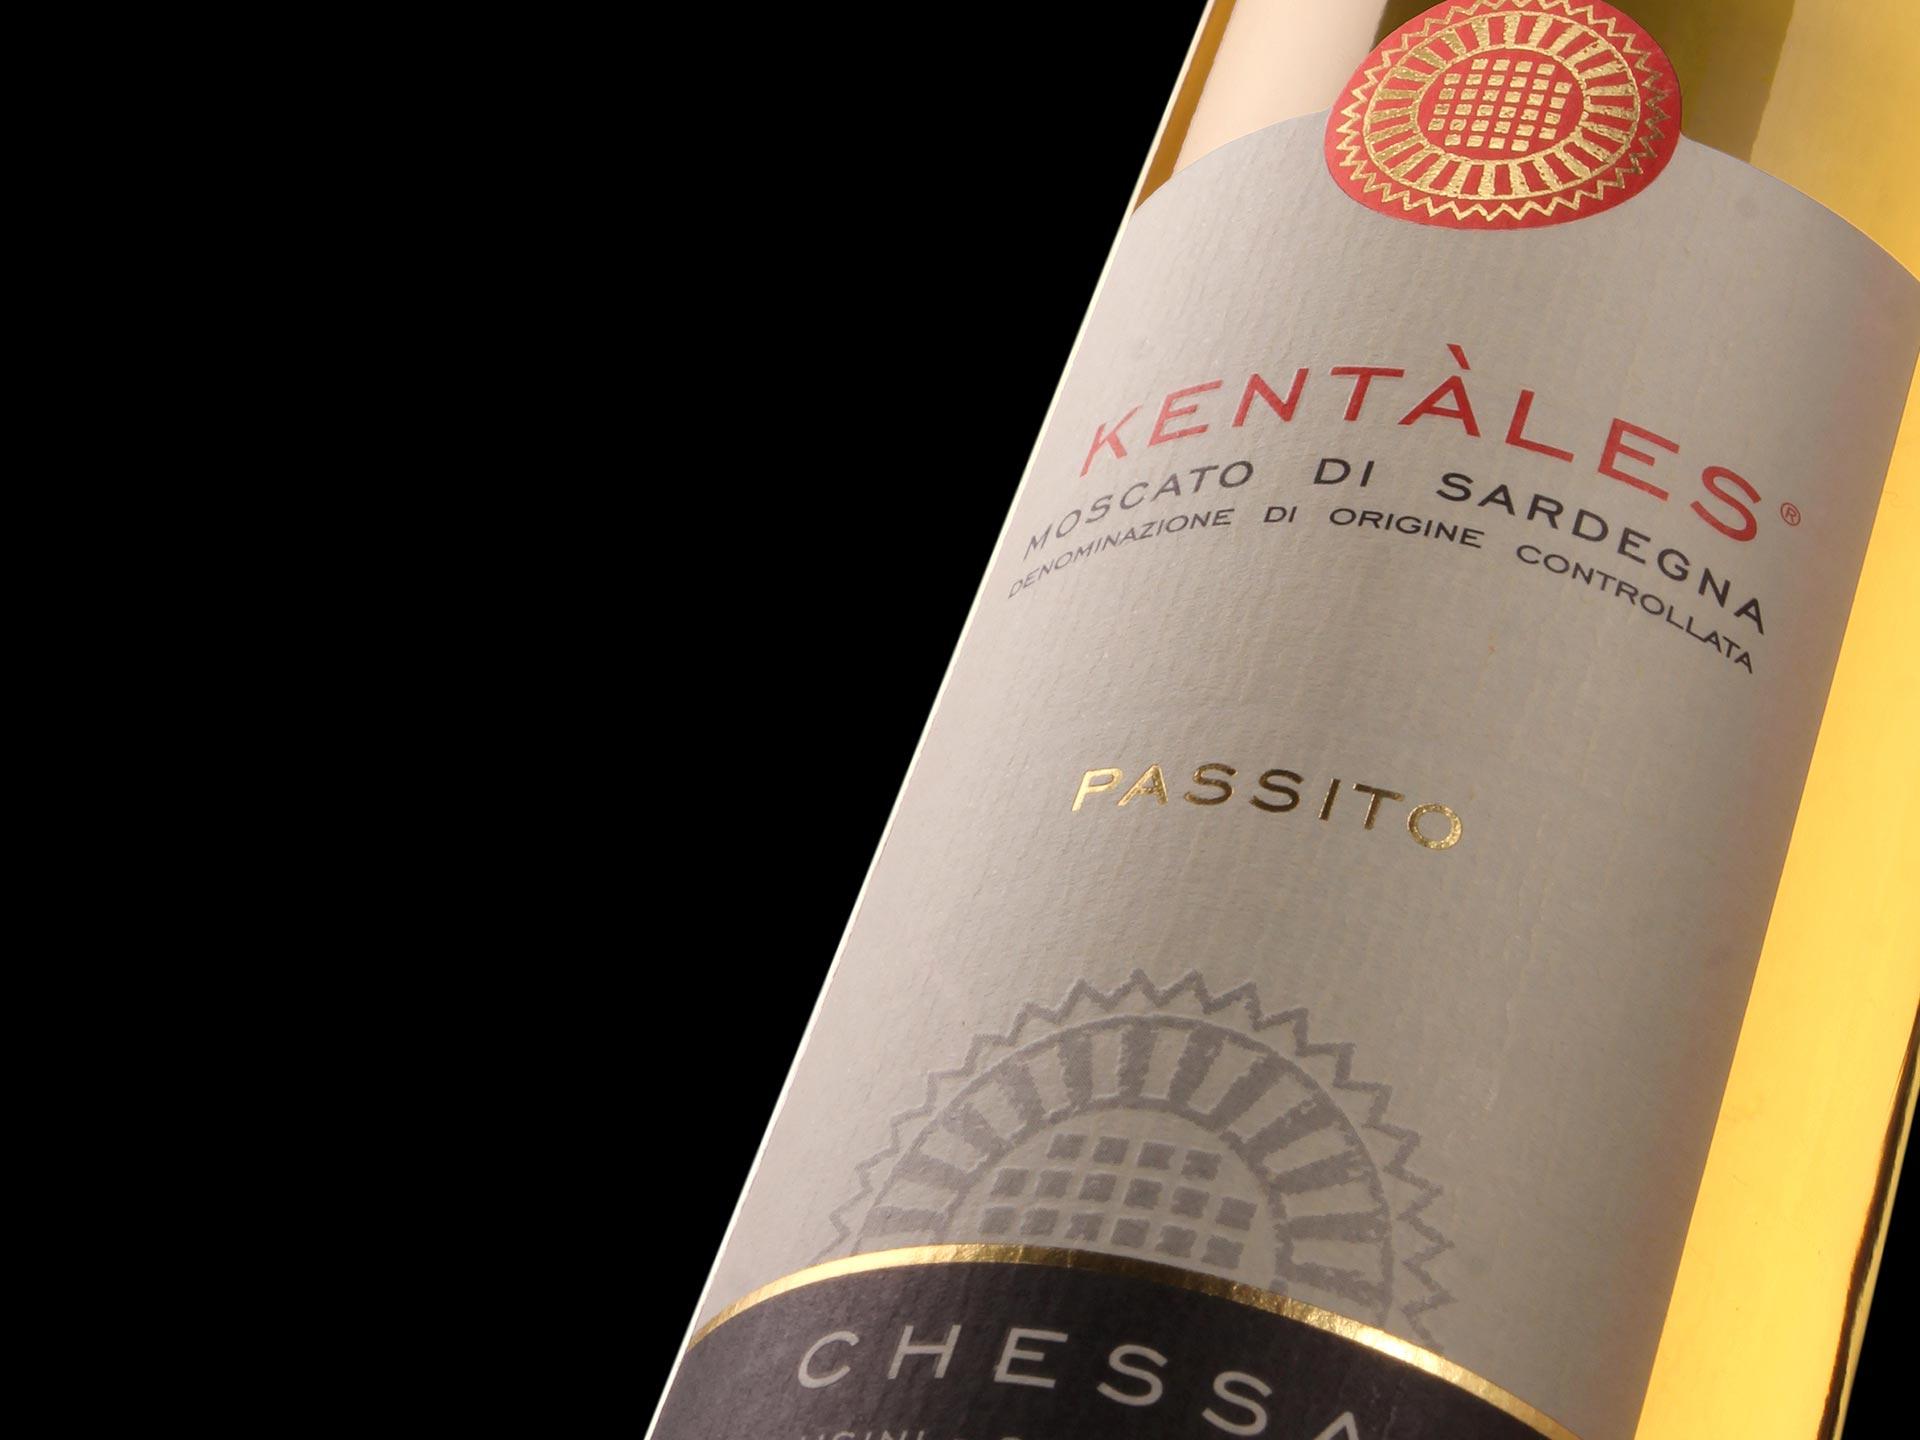 Progettazione etichetta vino - Kentàles - Cantine Chessa